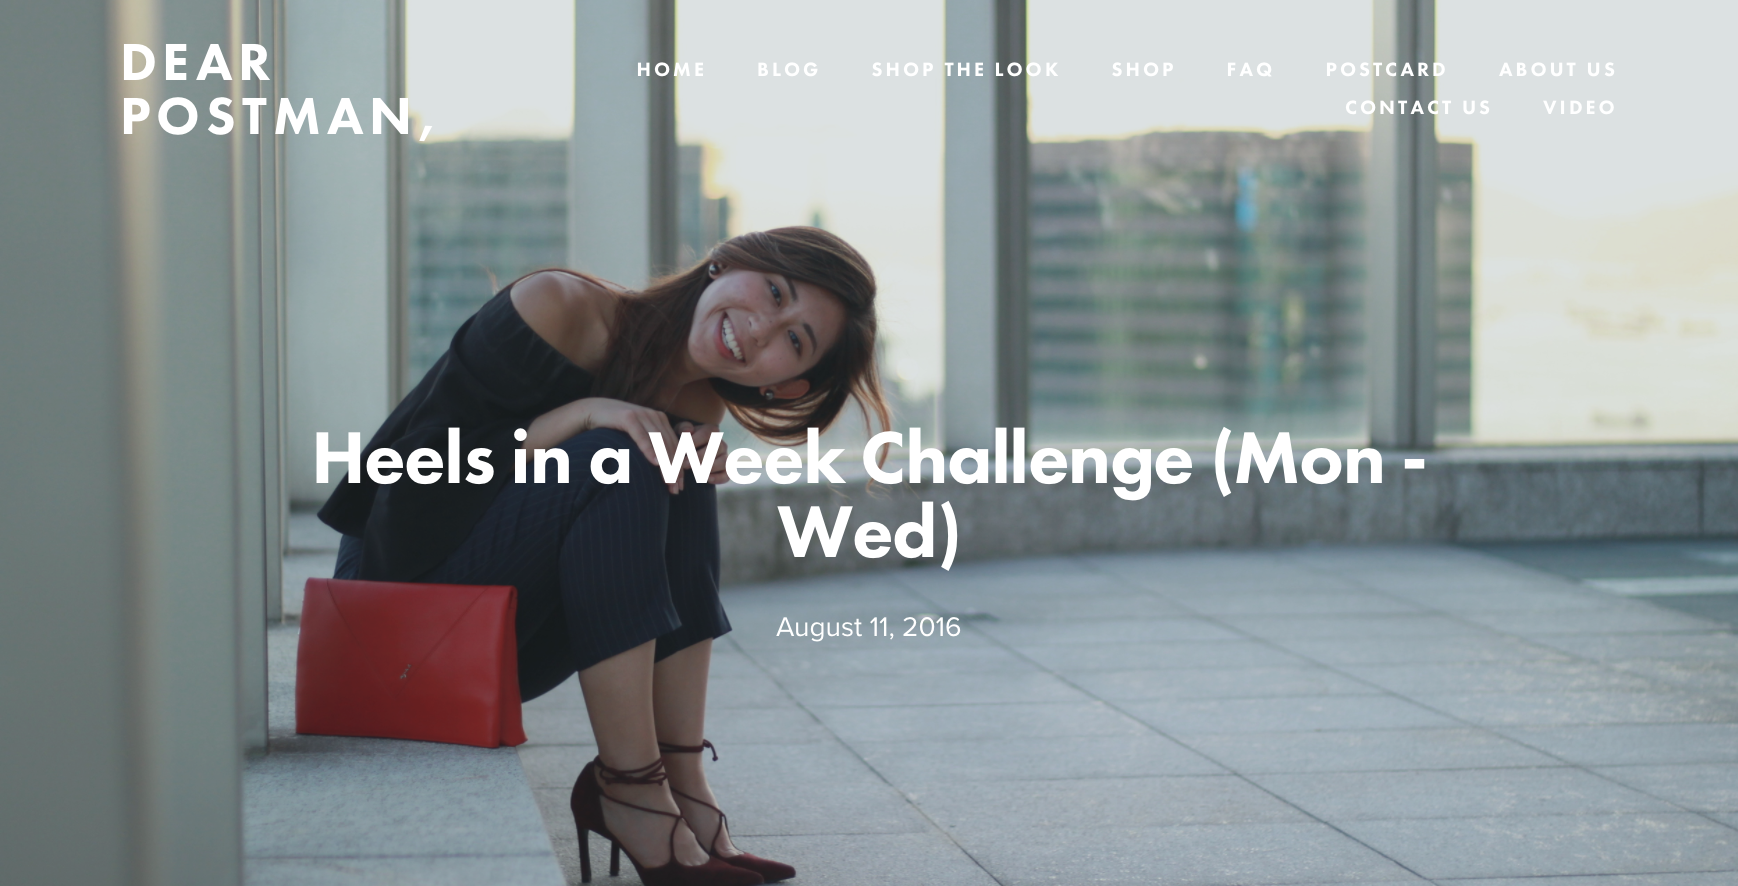 Heels in a Week Challenge (Mon - Wed)